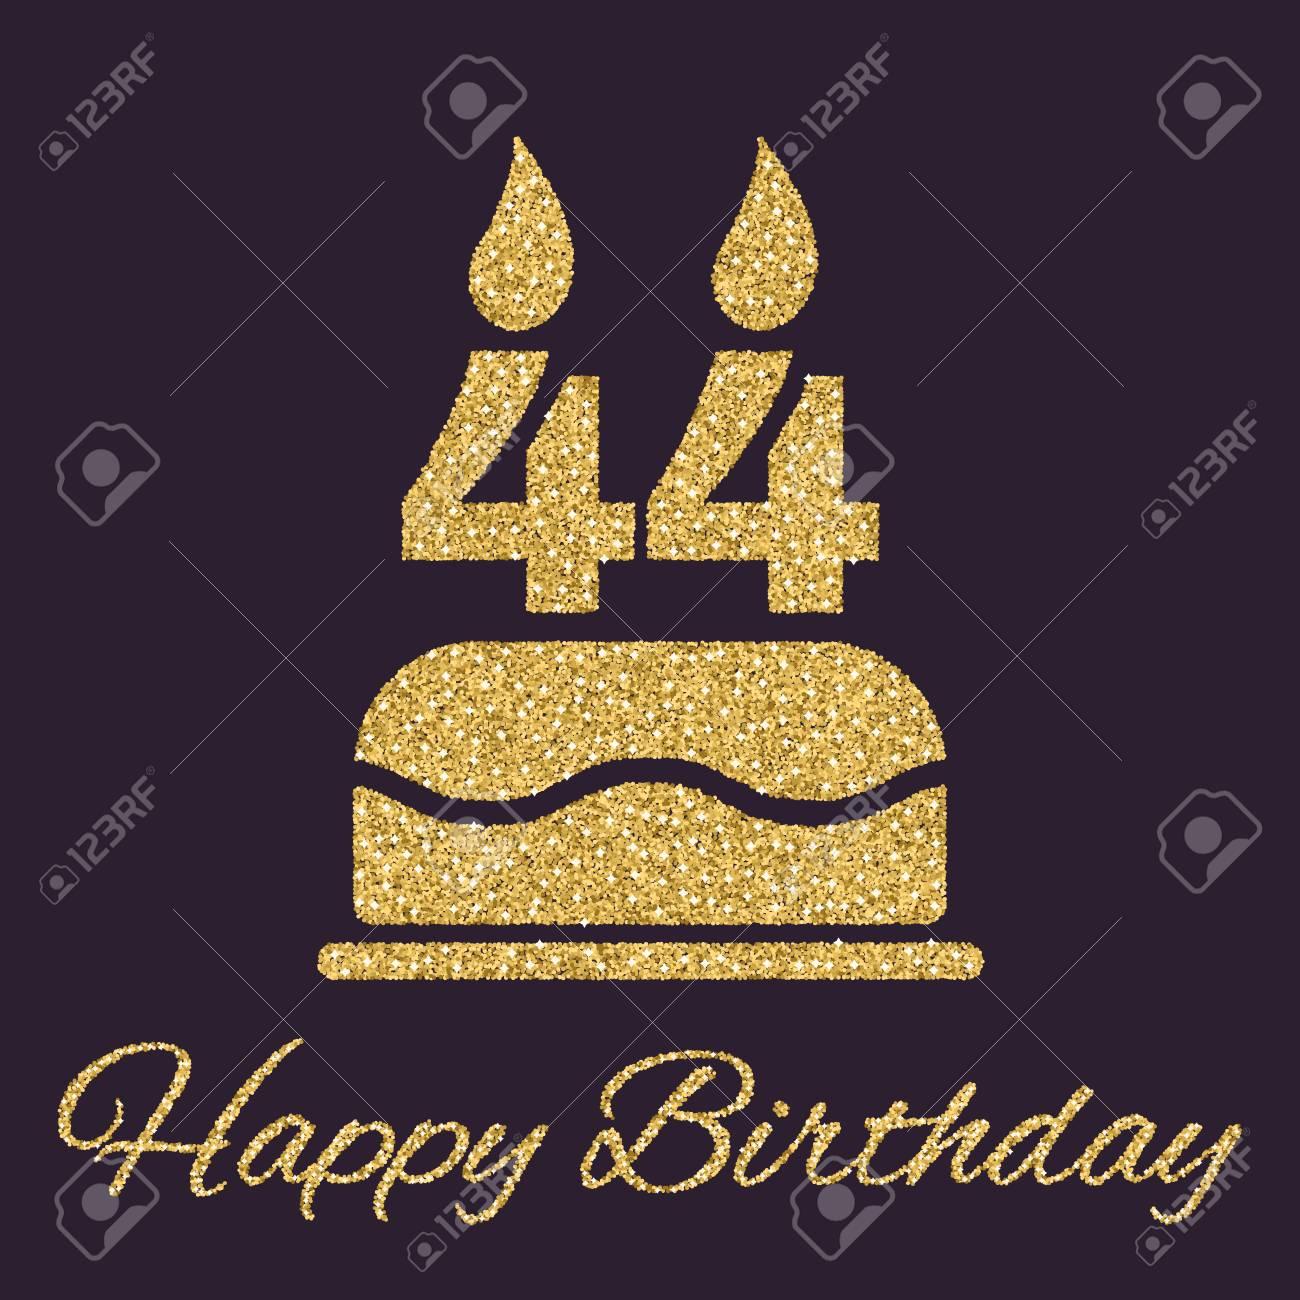 QATARம் கண்ட ராஜா-பிறந்த நாளில் வாழ்த்துவோம், வாருங்கள் . 64363988-the-birthday-cake-with-candles-in-the-form-of-number-44-icon-birthday-symbol-gold-sparkles-and-glitt